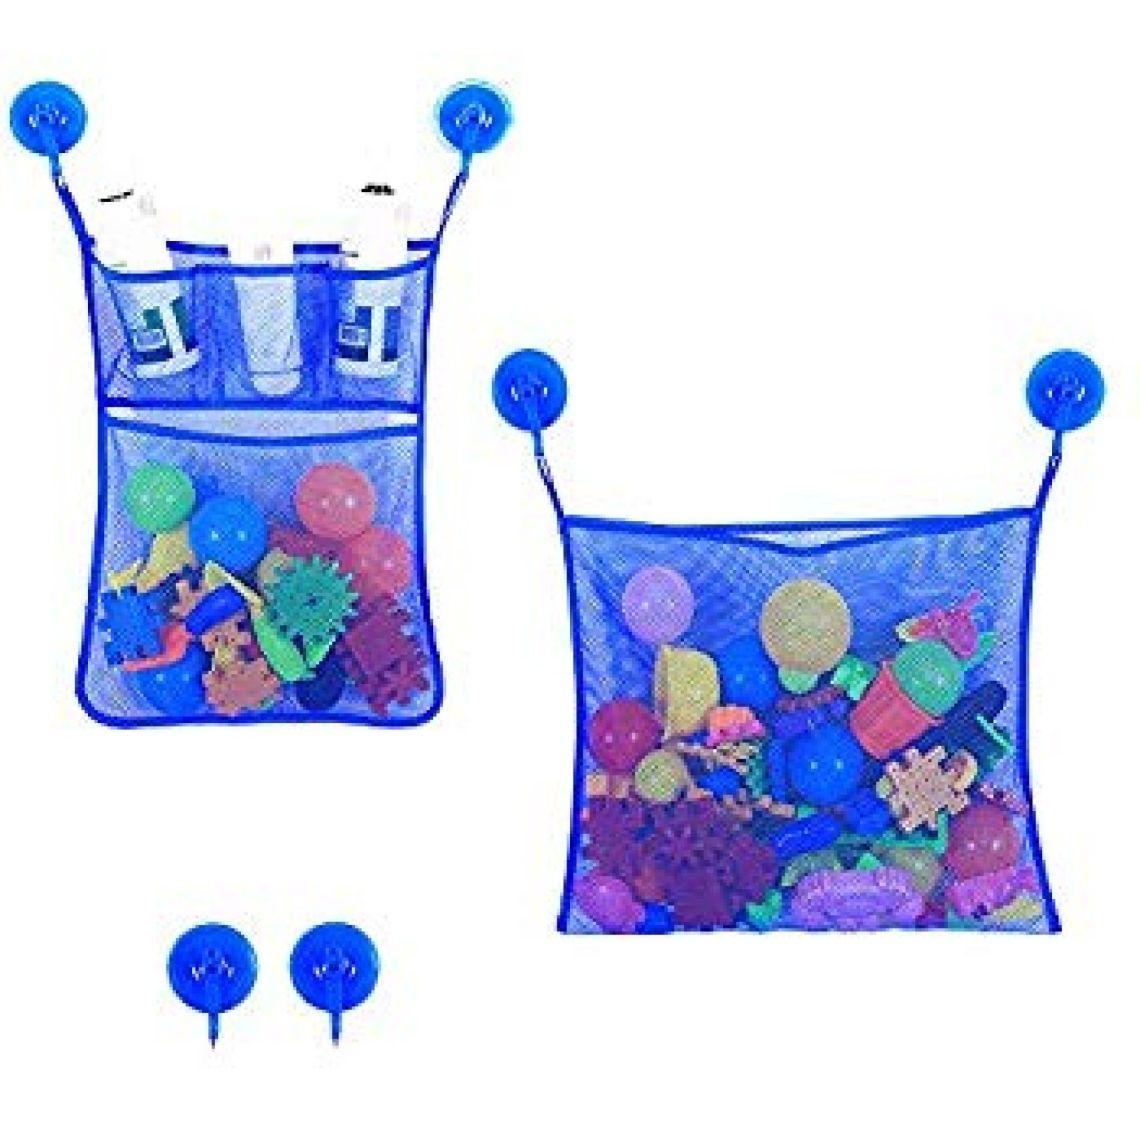 Amazon.com: caloics C Bath Toy Storage Organizer Baby Bathtub Toy Holder, 2 Mesh Net + 6 Anti-Slip Hooks, Bathroom Storage Shower Shampoo Soap Organizer (Blue Mesh): Toys & Games